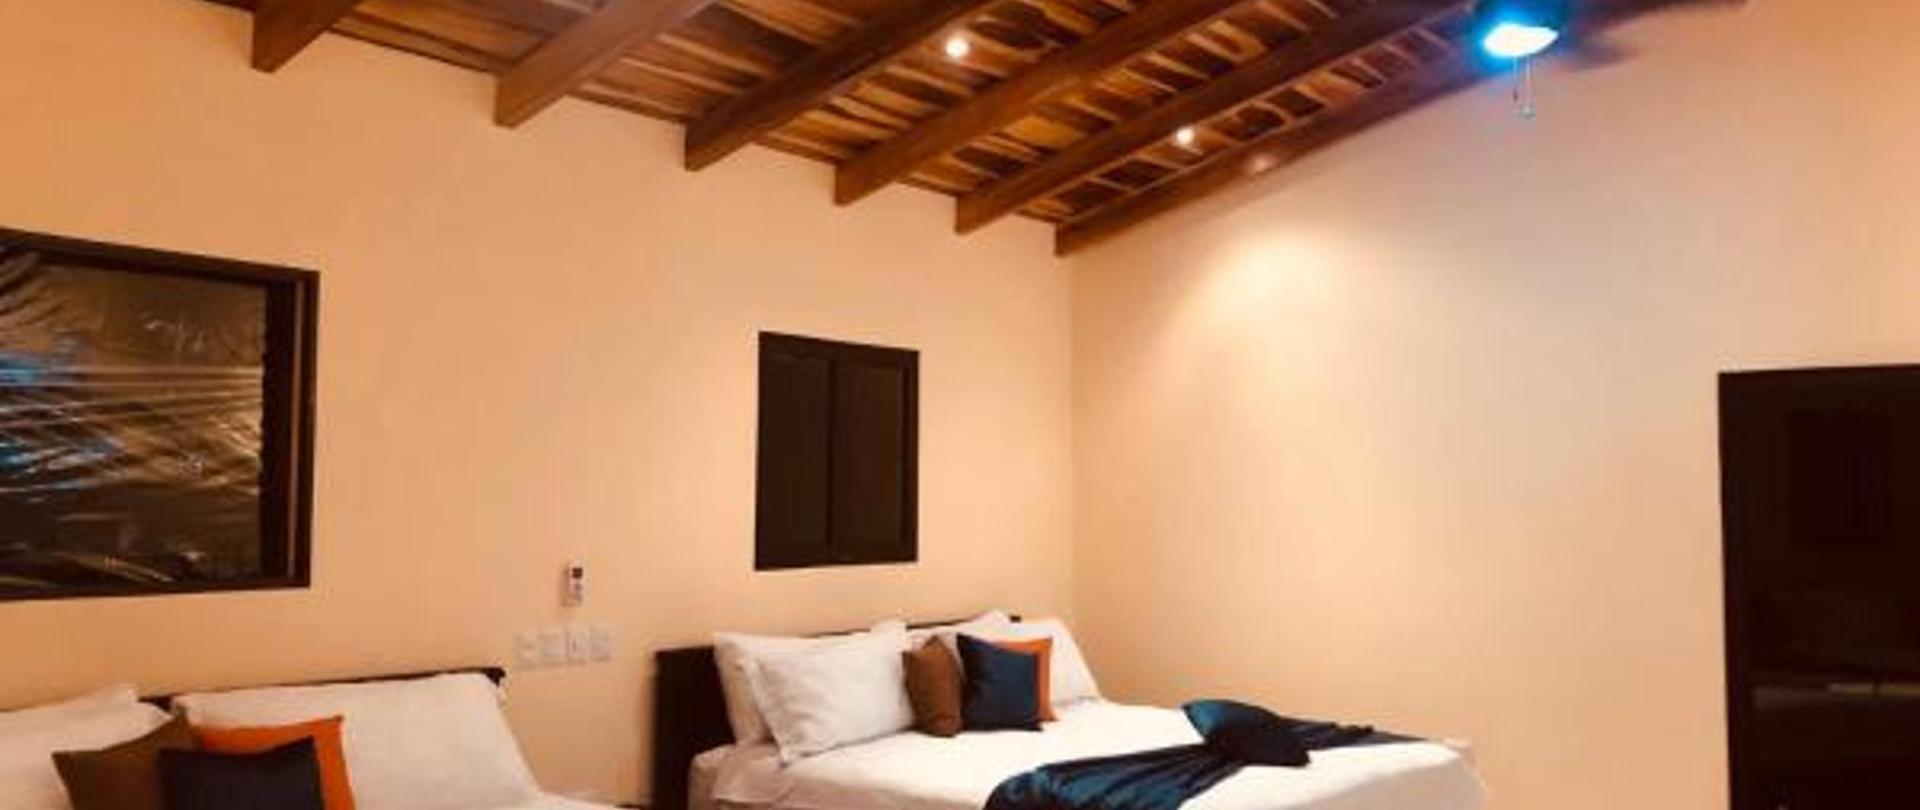 room 13-1.jpg